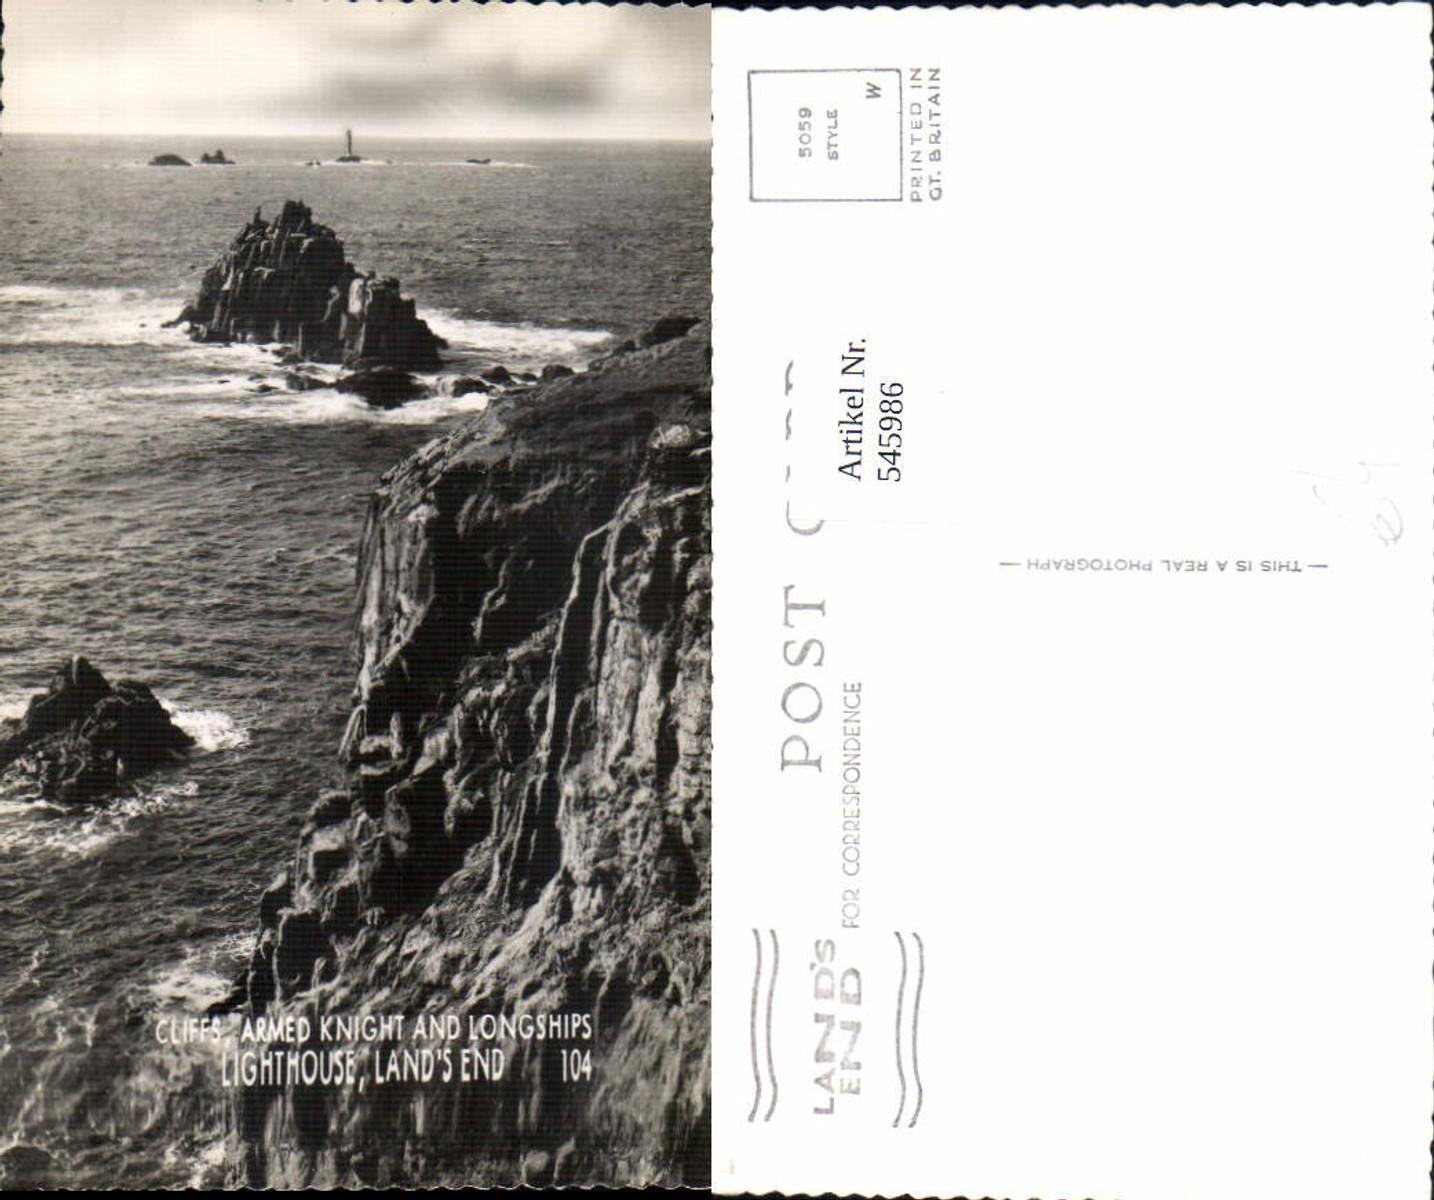 545986,England Land`s End Lighthouse Longships Penzance Cornwall günstig online kaufen